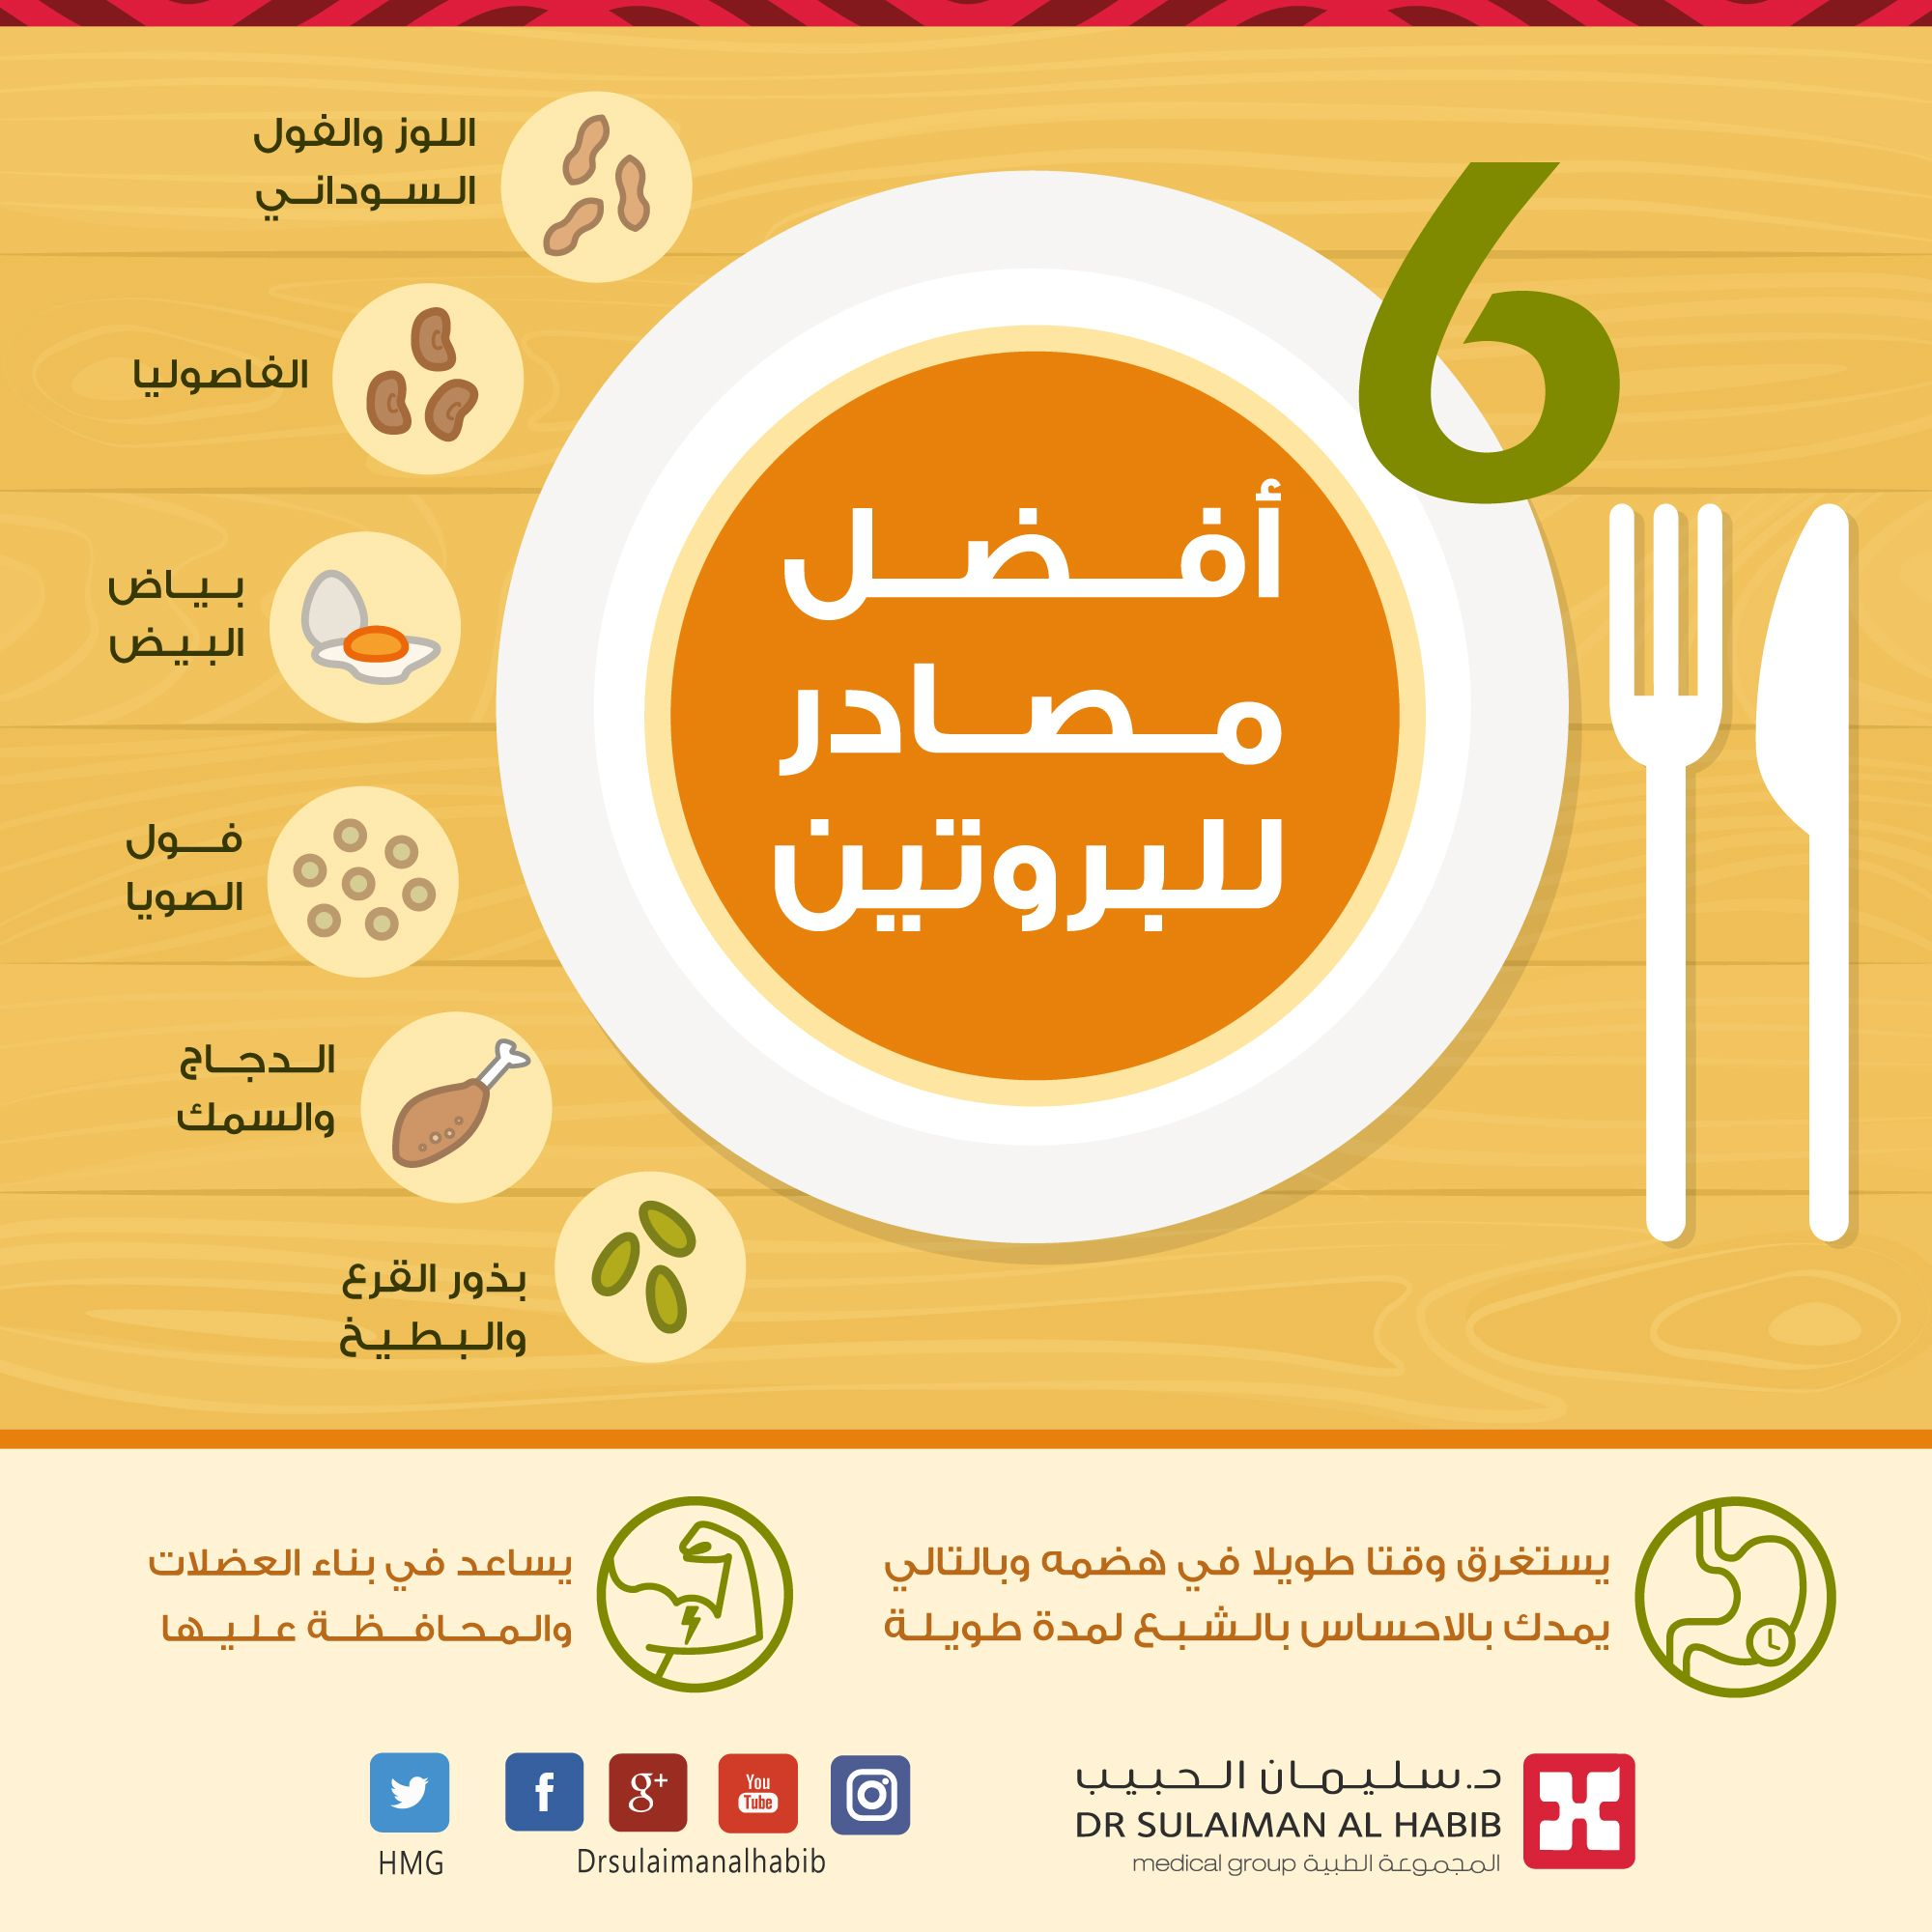 أفضل مصادر البروتين صحة تغذية بروتين Health Protein Health Tips Food And Drink Nutrition